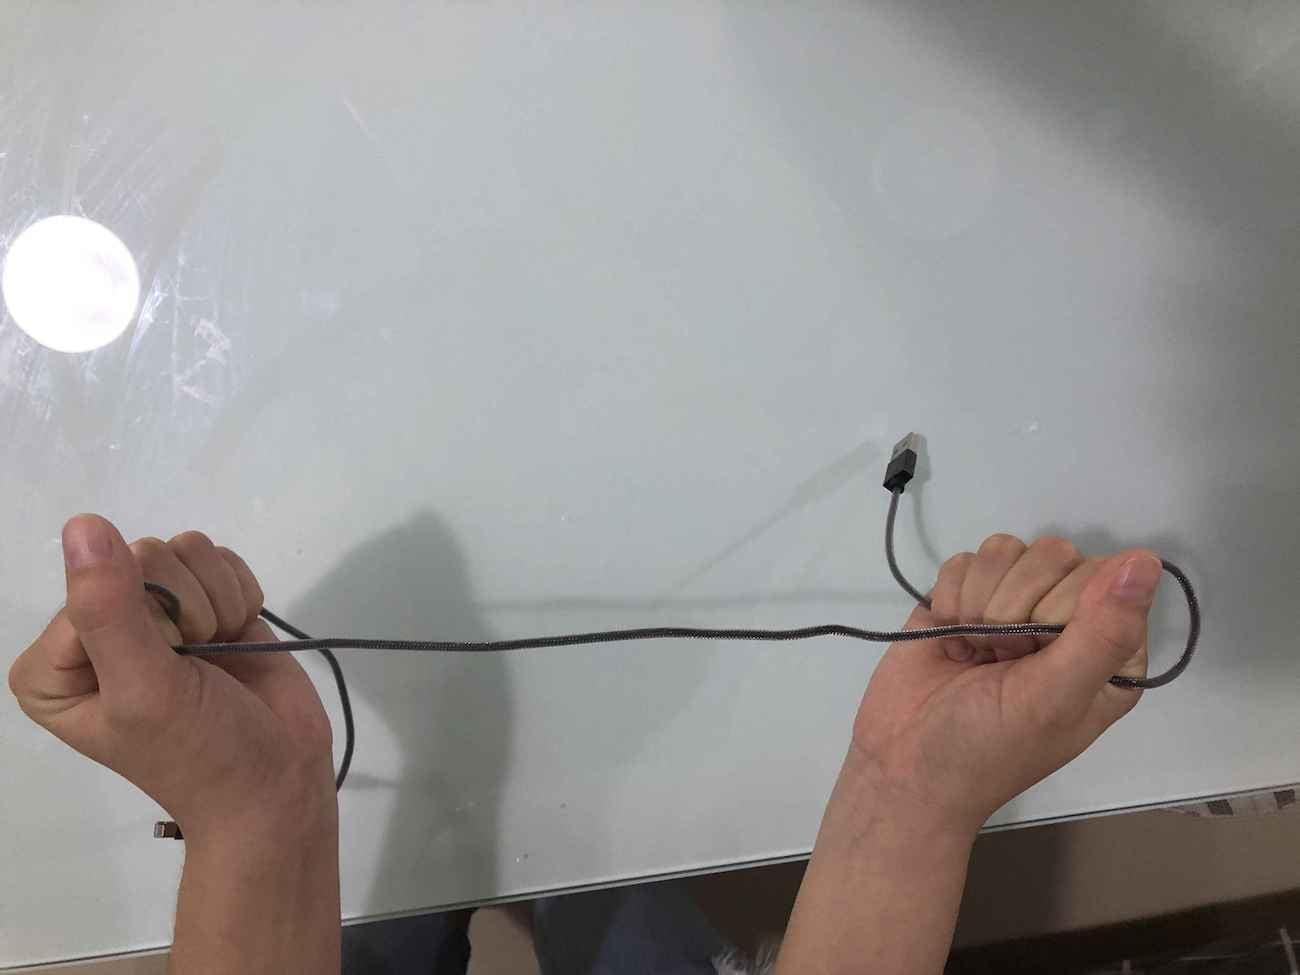 IQIYI Ultra Durable Lightning USB Cable